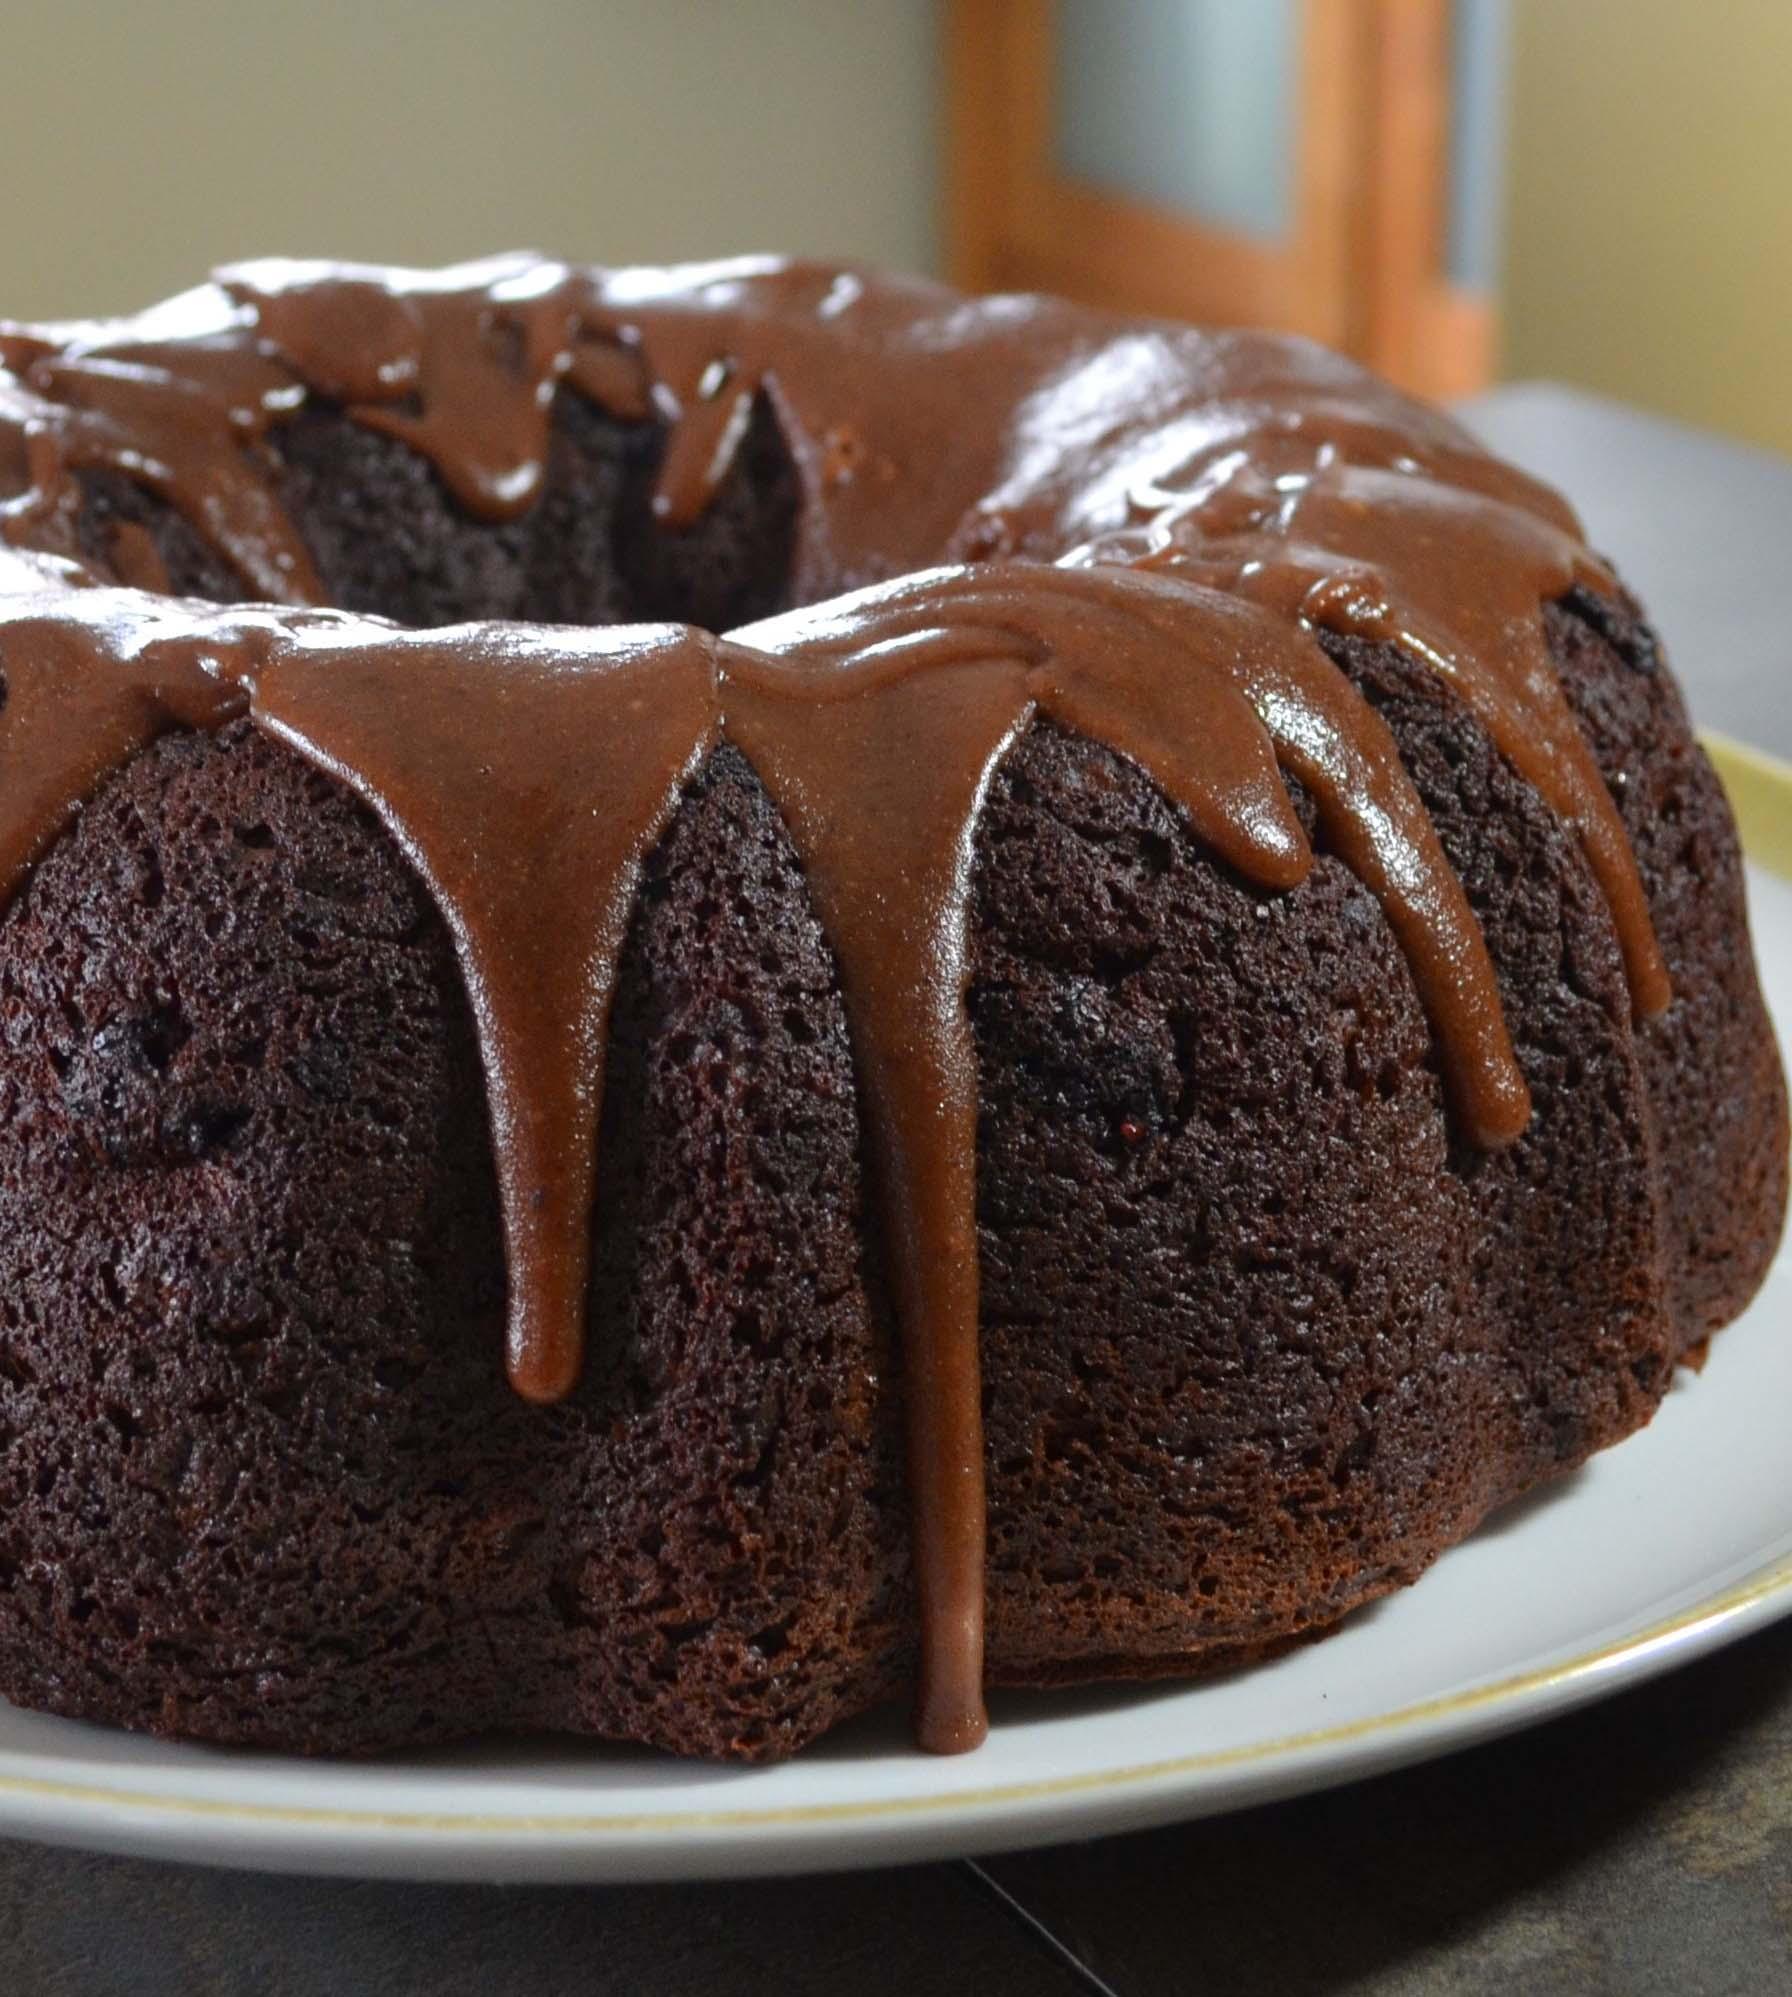 romance chocolate cake recipe from EatSomethingSexy.com